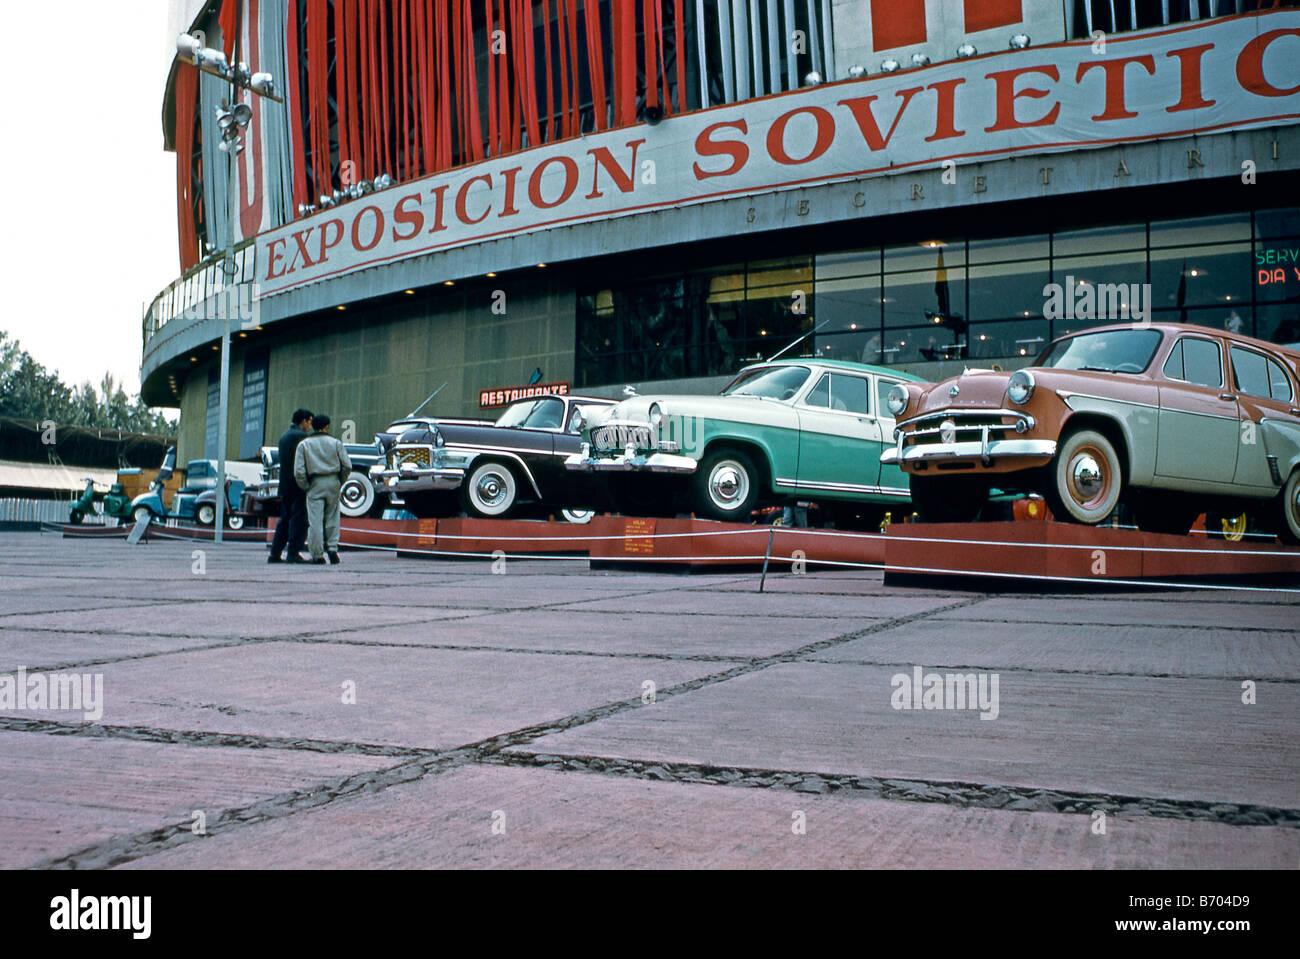 GAZ Chaika Mk 1 car at a Russian trade expo in Mexico City, c. 1966 Stock Photo